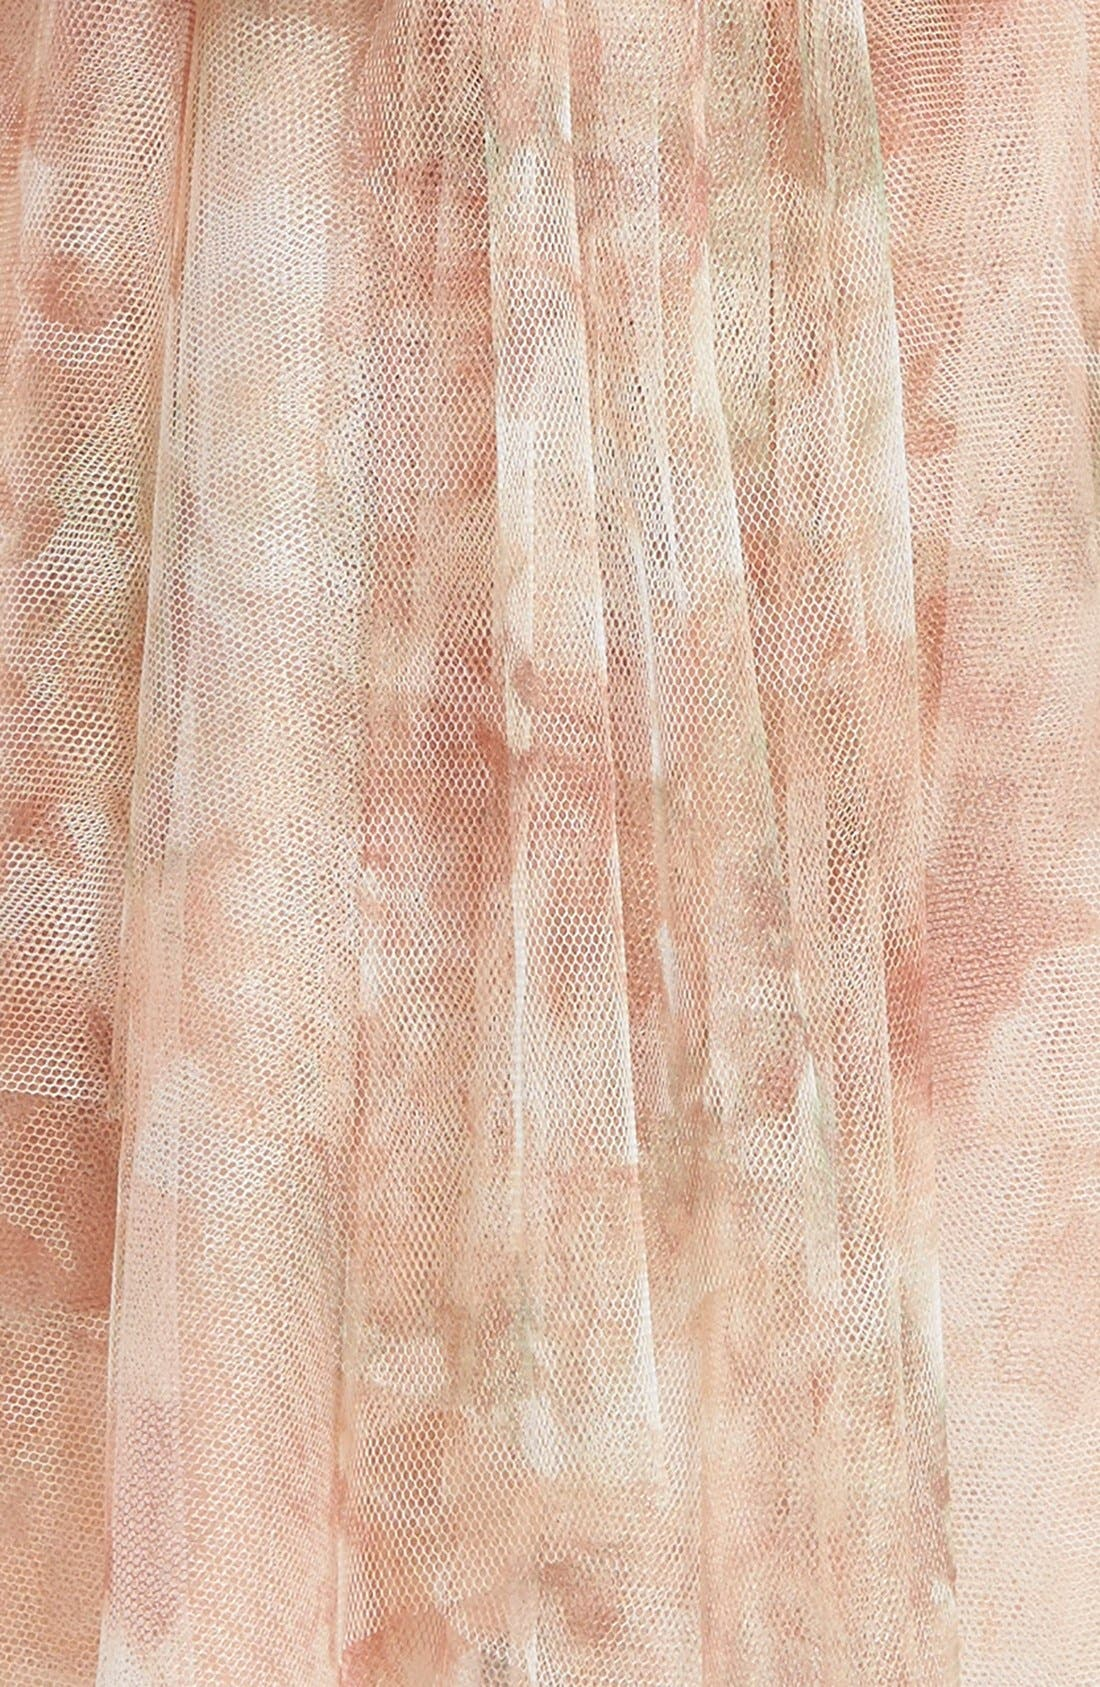 Etsy - Vintage Floral Tulle Dress,                             Alternate thumbnail 3, color,                             Blush Multi